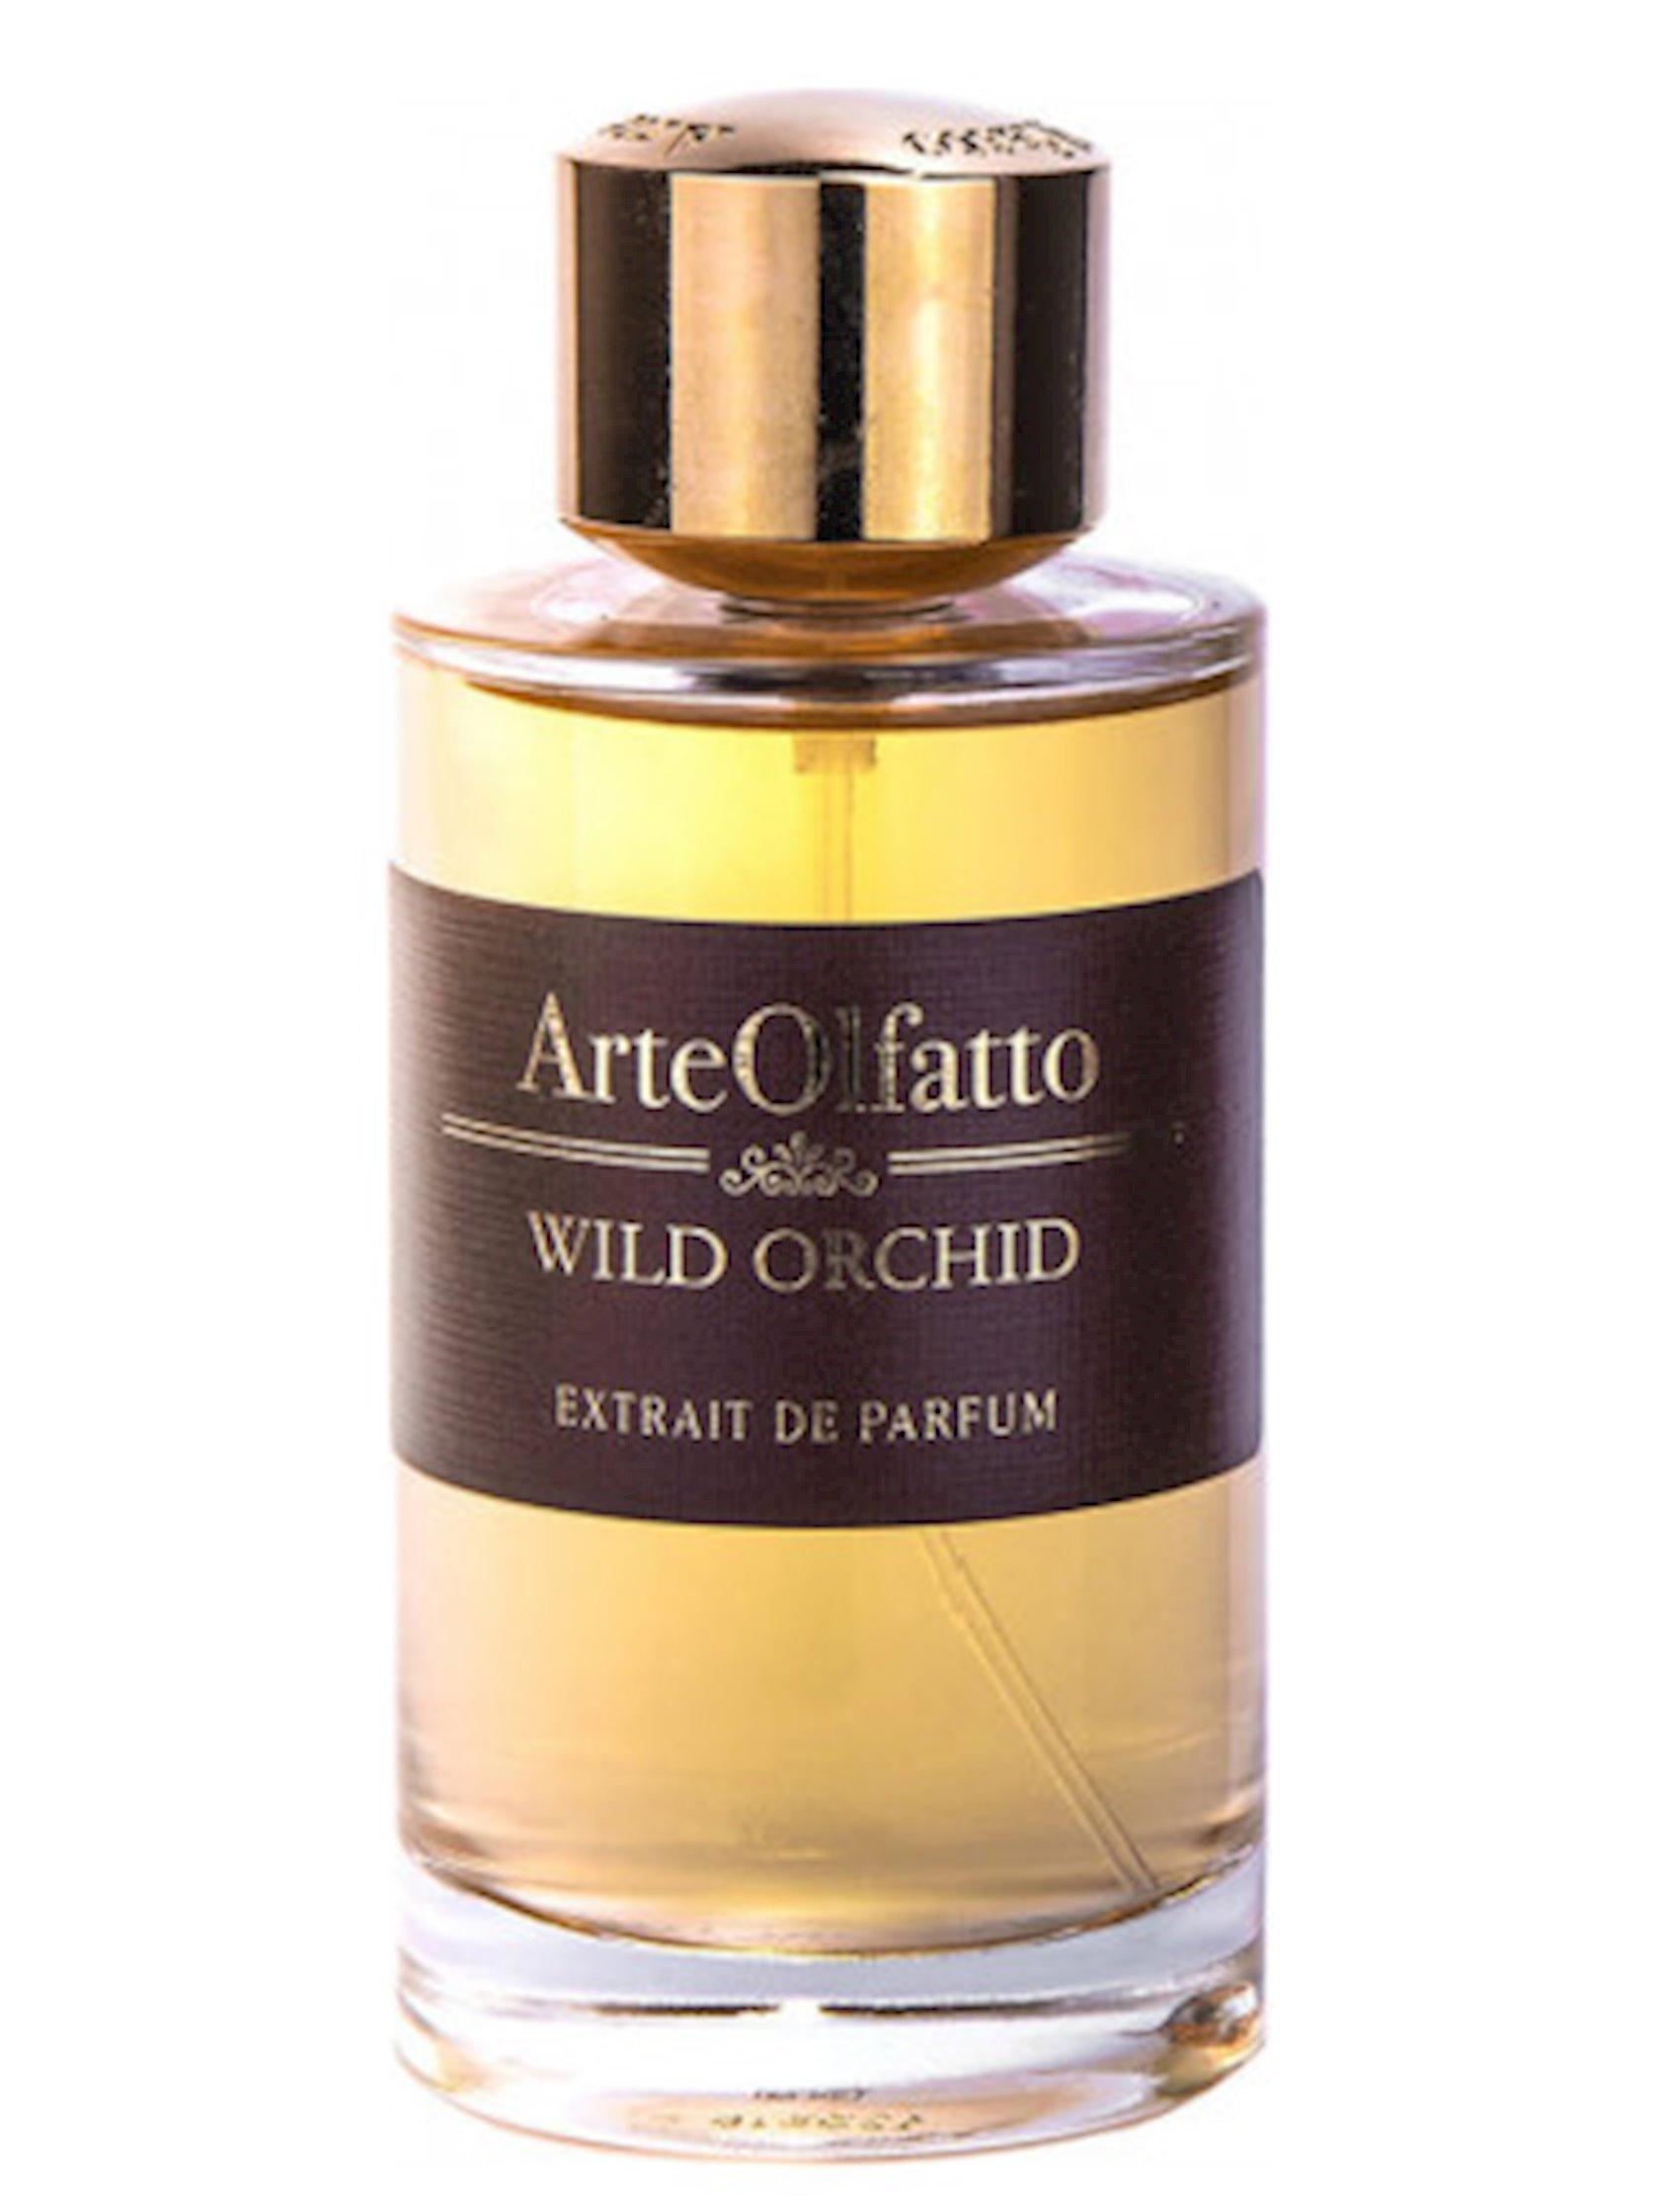 Uniseks ətir suyu ArteOlfatto Wild Orchid 100ml